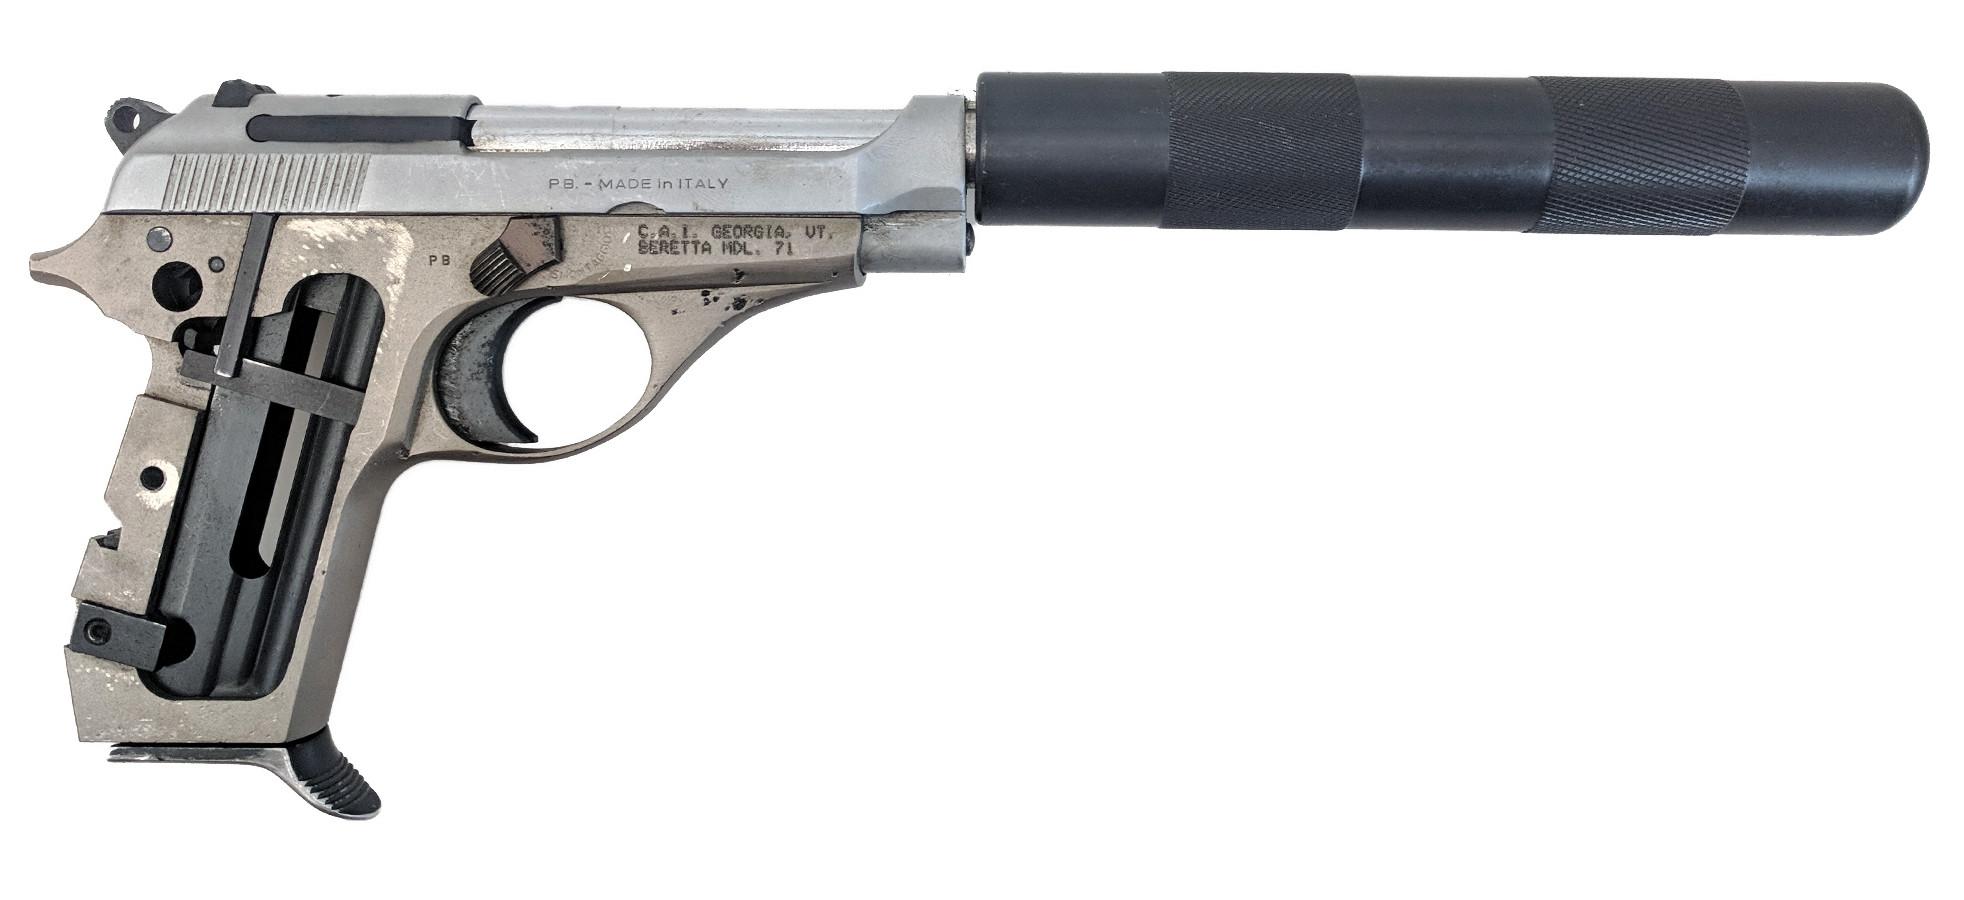 Beretta 71, .22LR